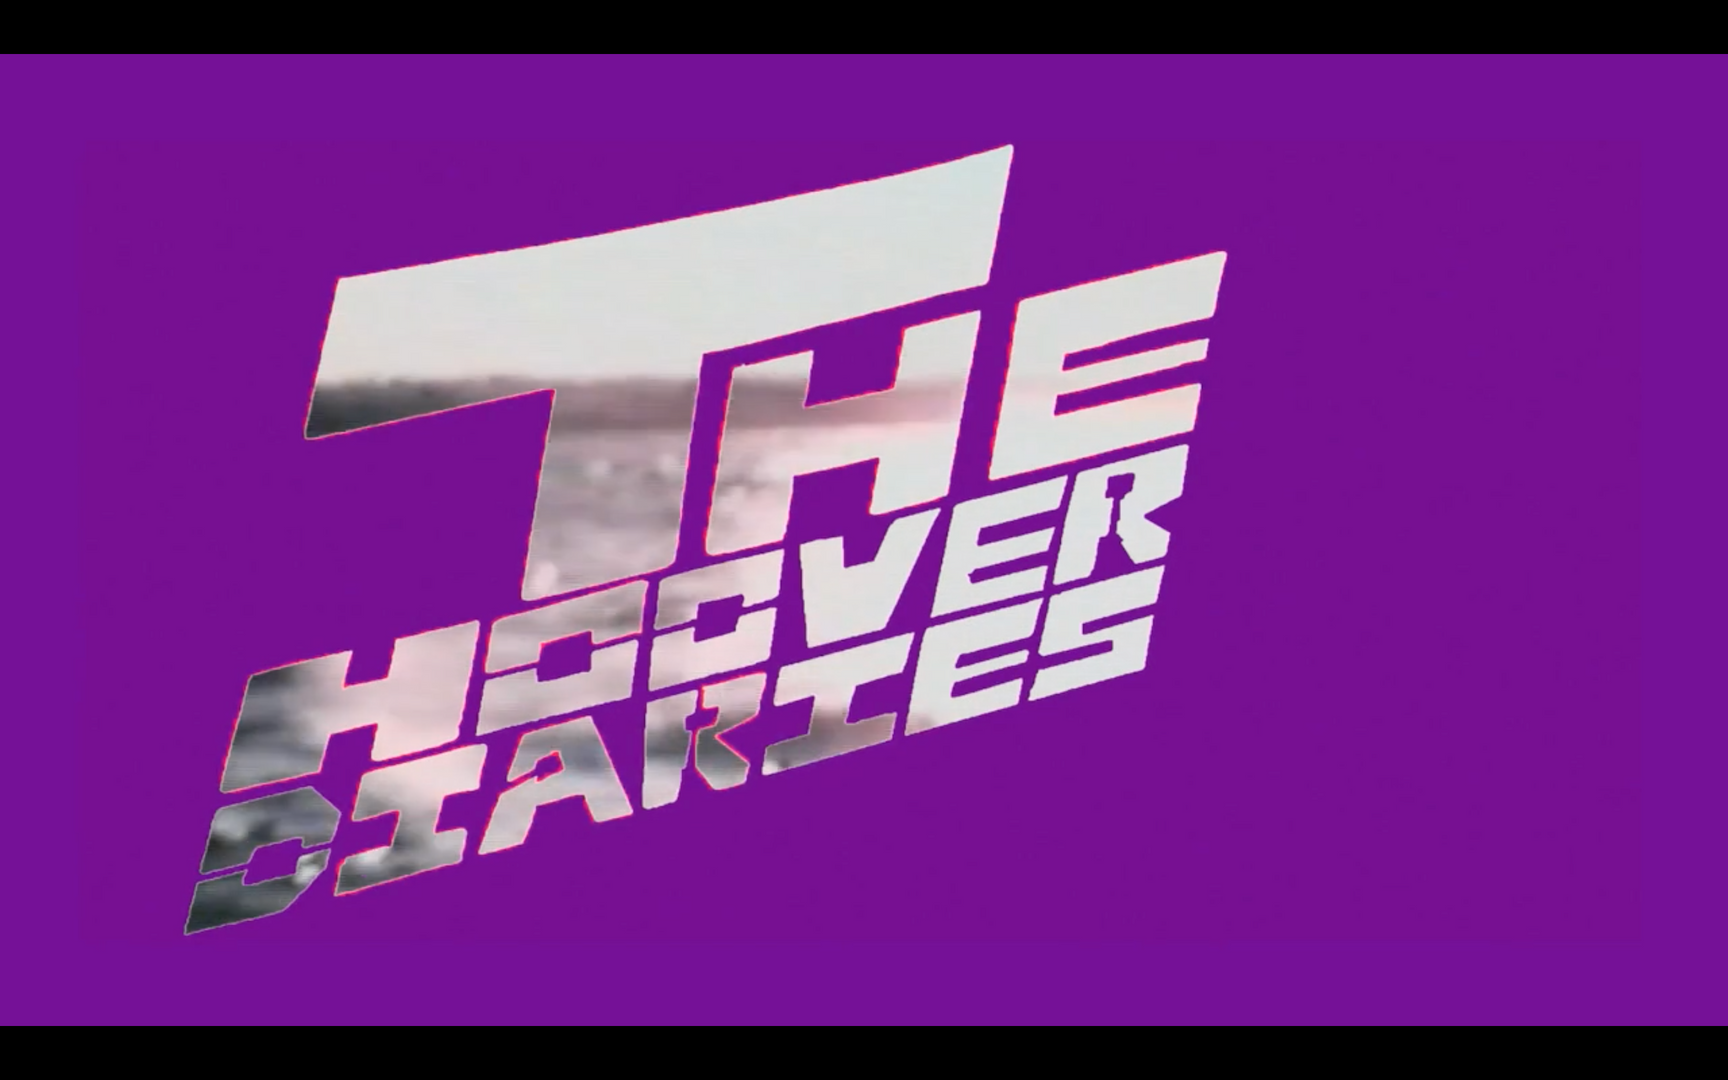 Amanda Newall, The Hoover Diaries. Video still.